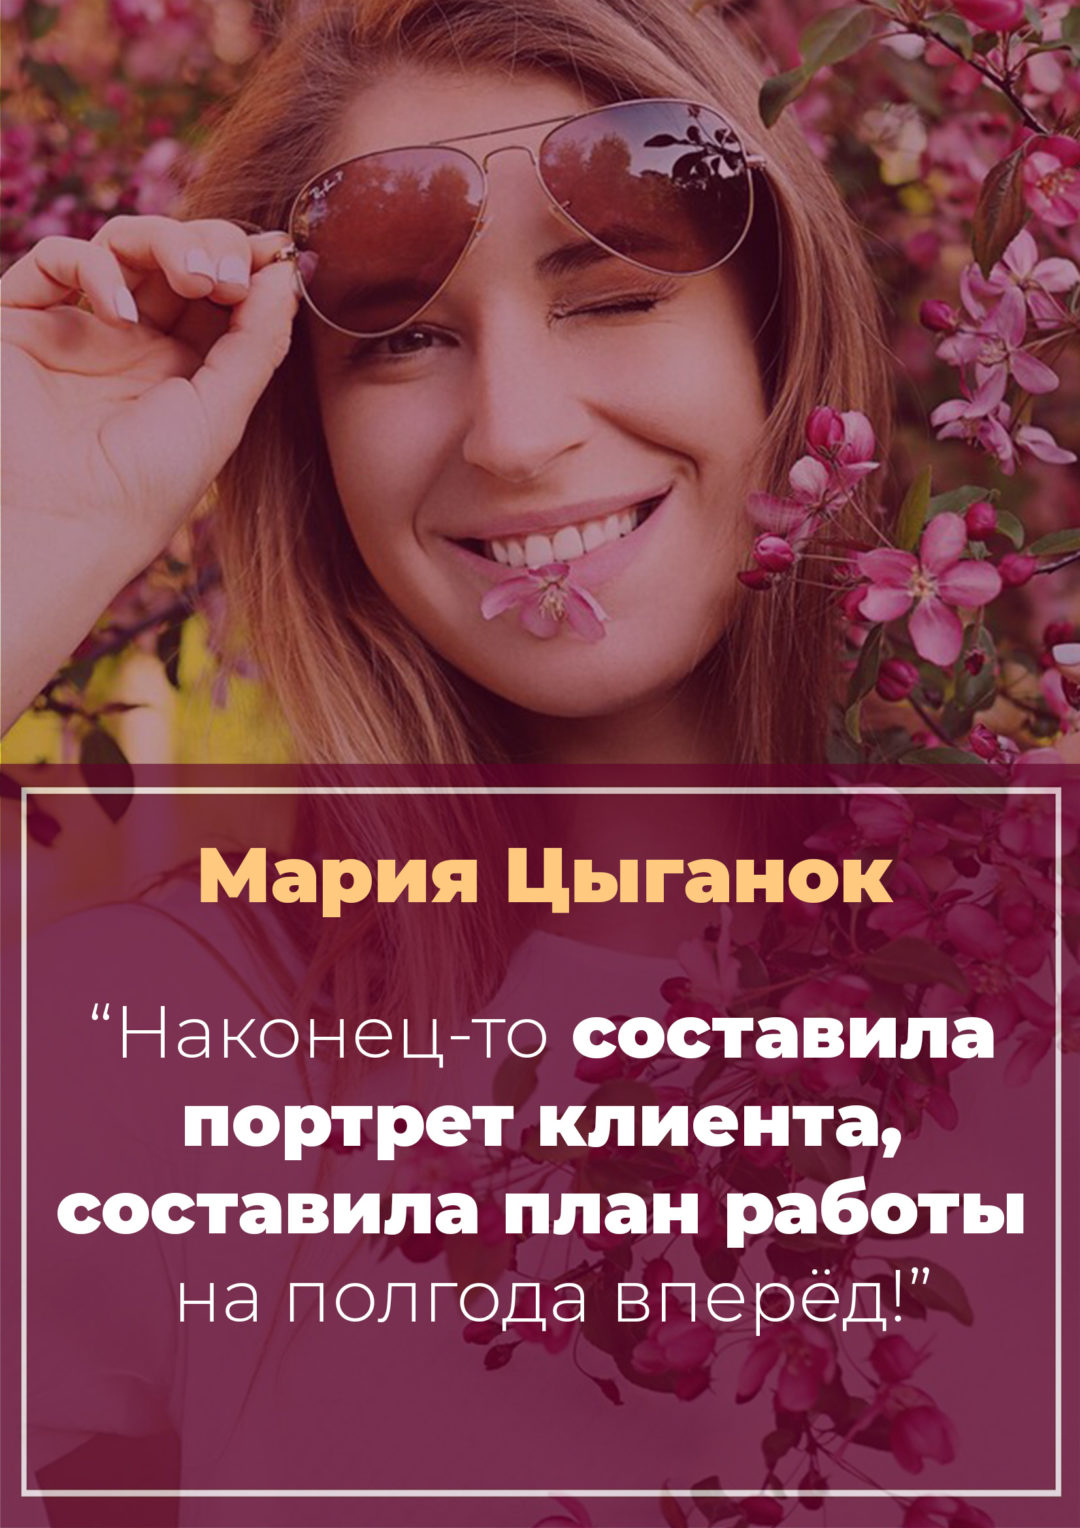 История Марии Цыганок